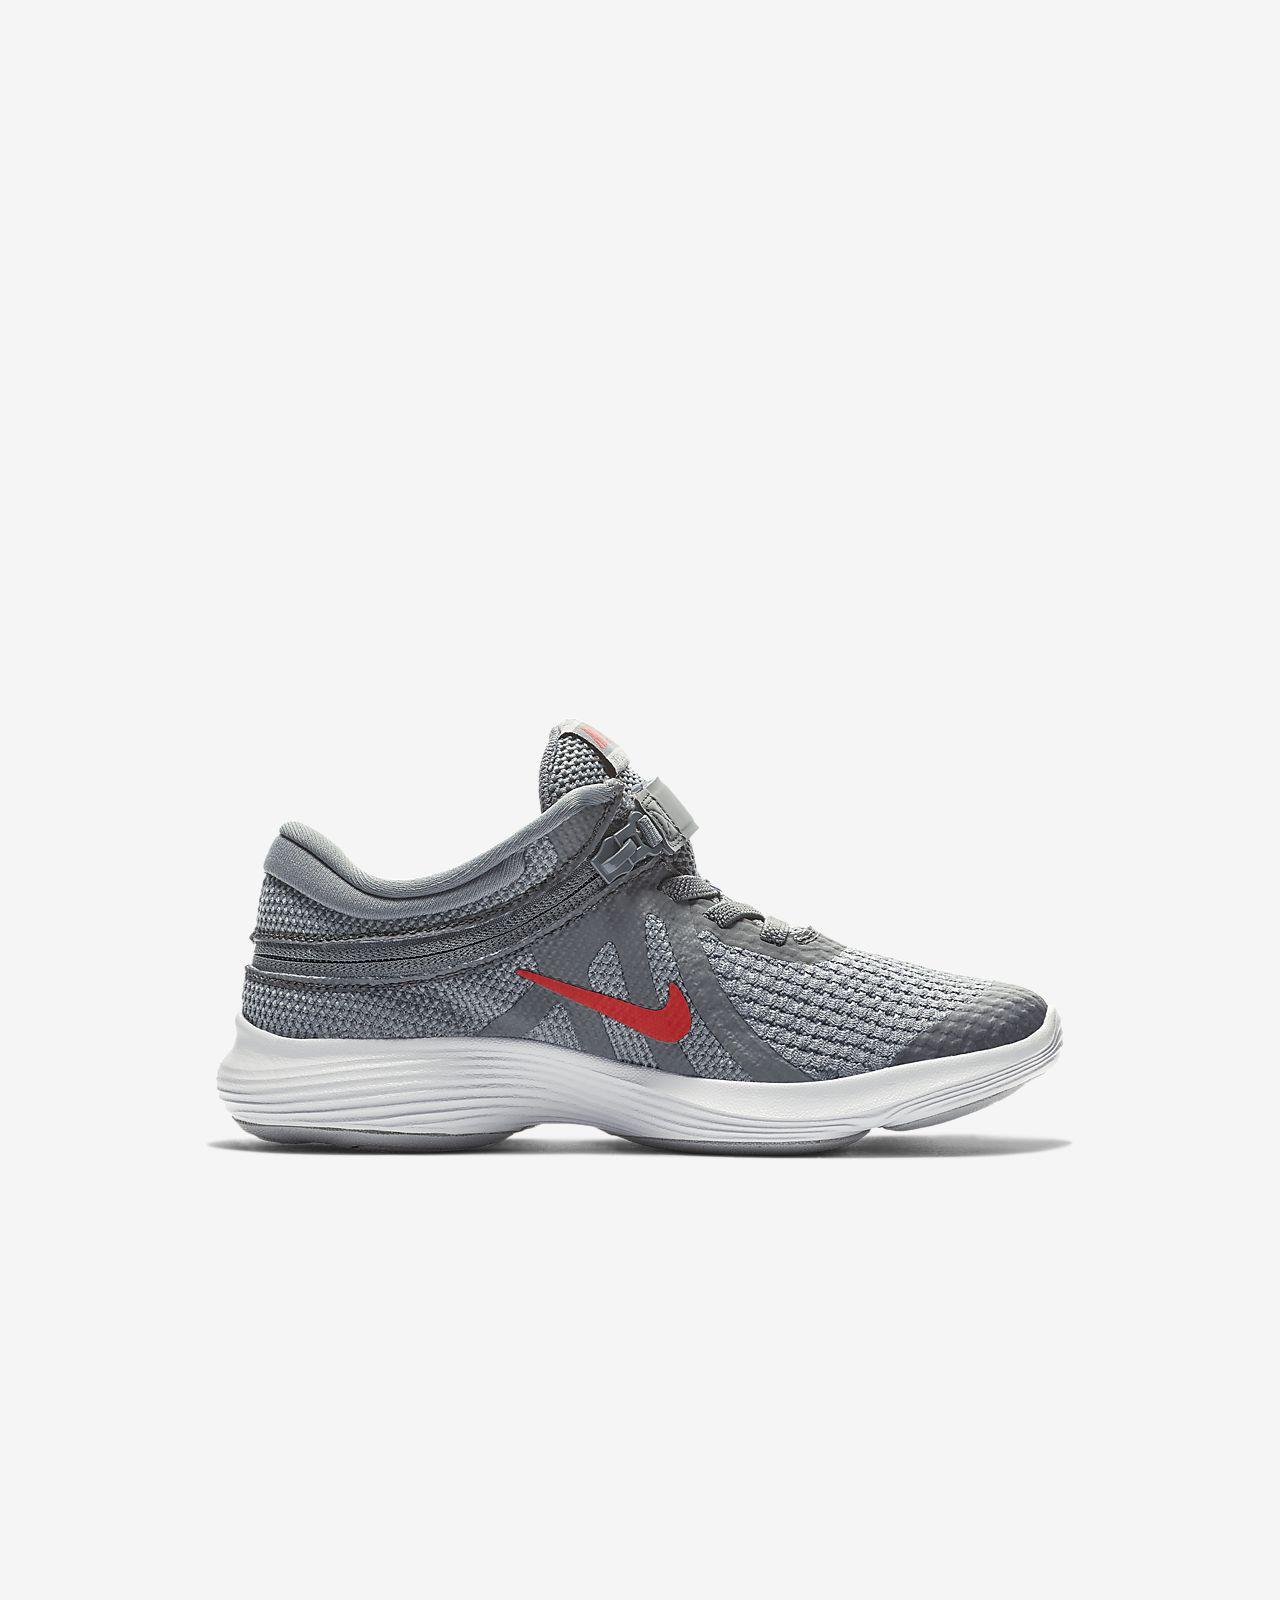 7269bb11c199 Nike Revolution 4 FlyEase Little Kids  Shoe. Nike.com